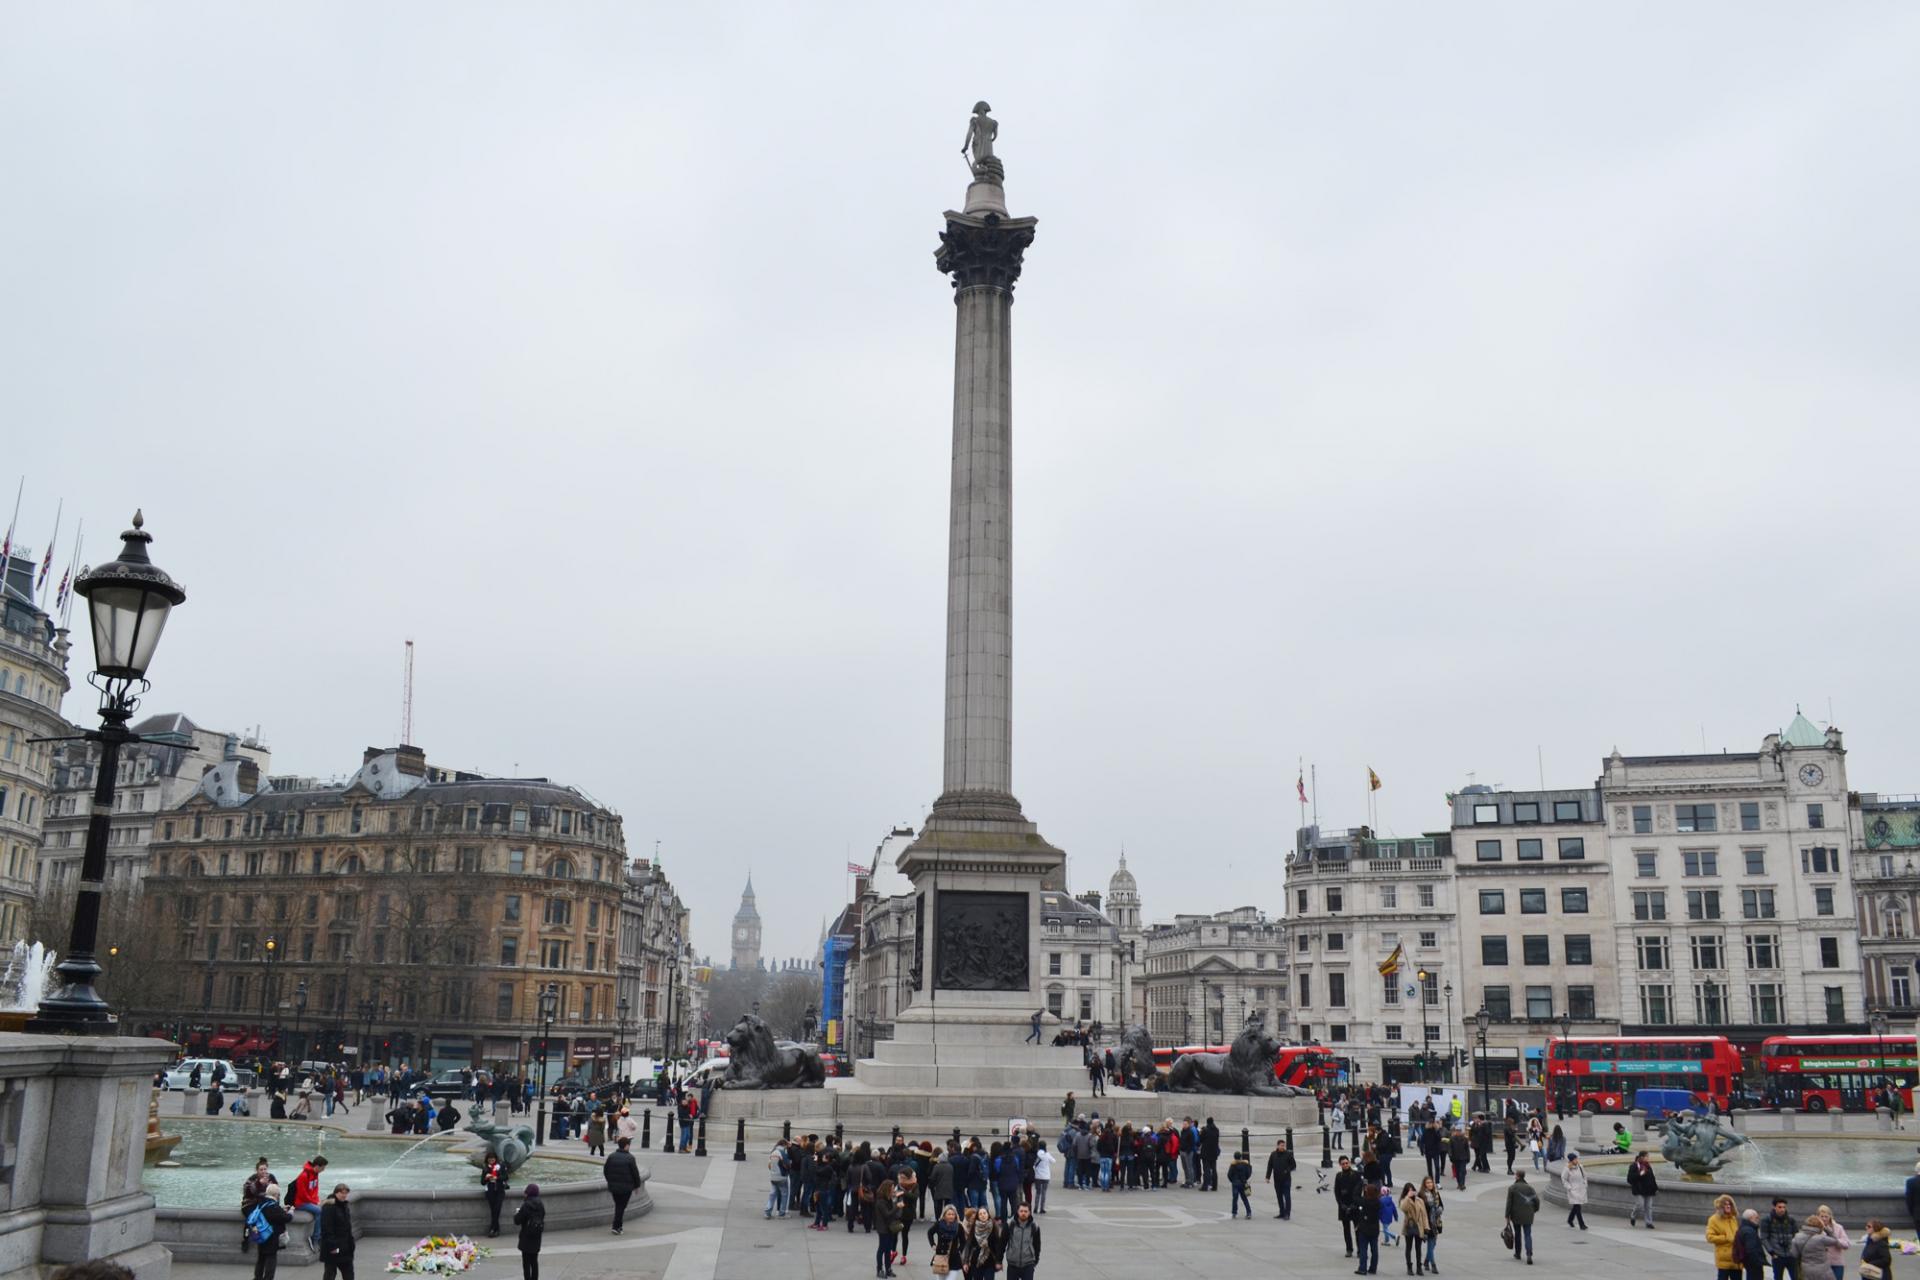 Las Trafalgar Square en Londres